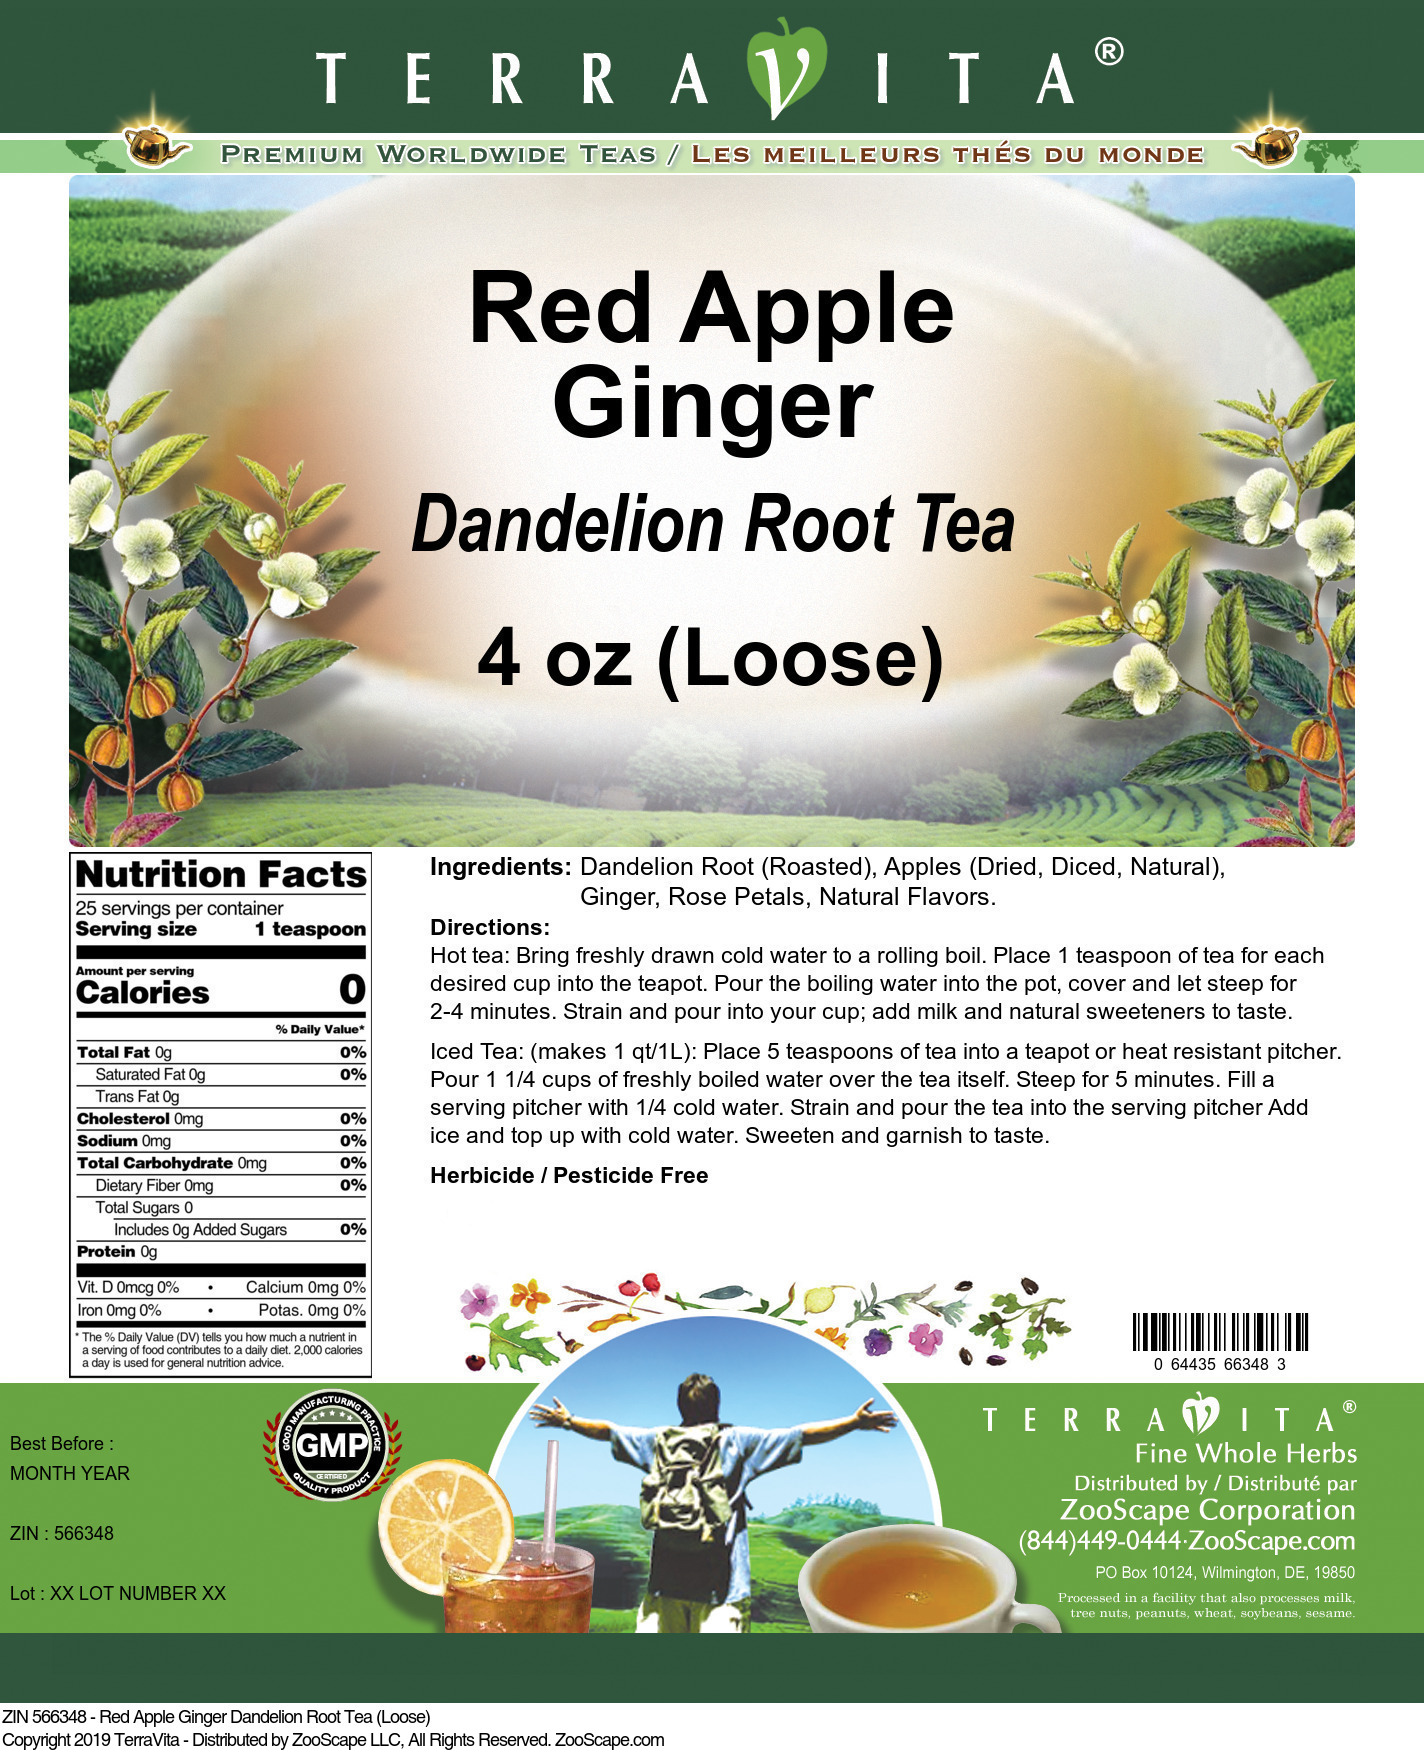 Red Apple Ginger Dandelion Root